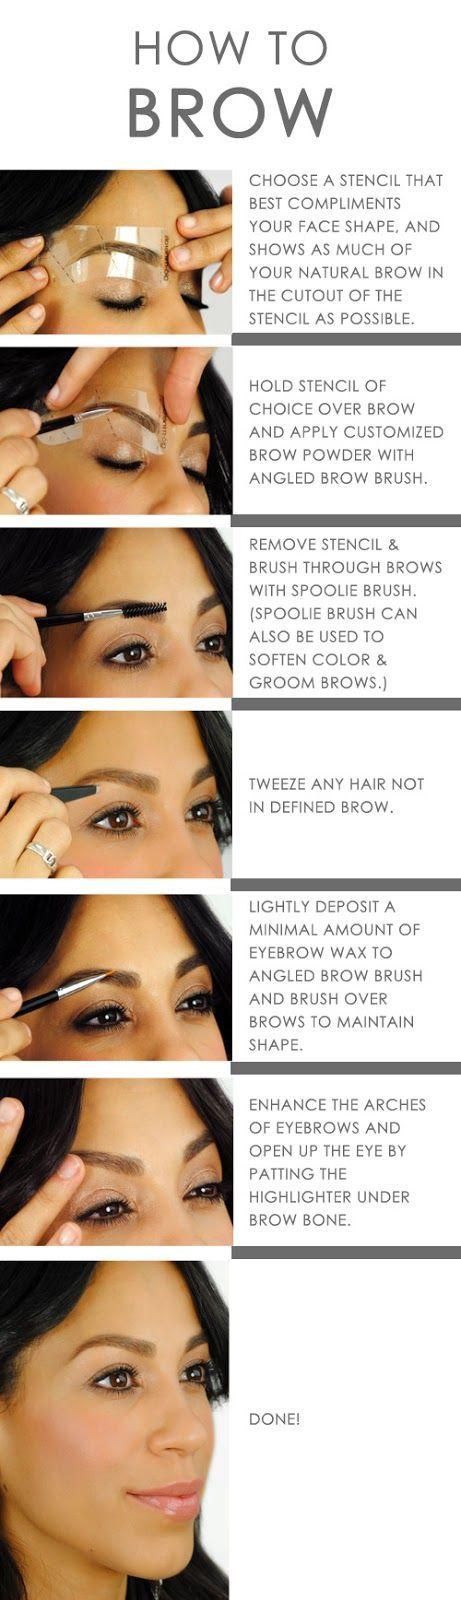 Peel off Eyebrow Enhancer Tint Gel Tattoo Makeup Eyebrow Cream Dye Color  Natural 3 Days Long Lasting 5g | Tutoriales para el cabello | Pinterest |  Eyebrow ...